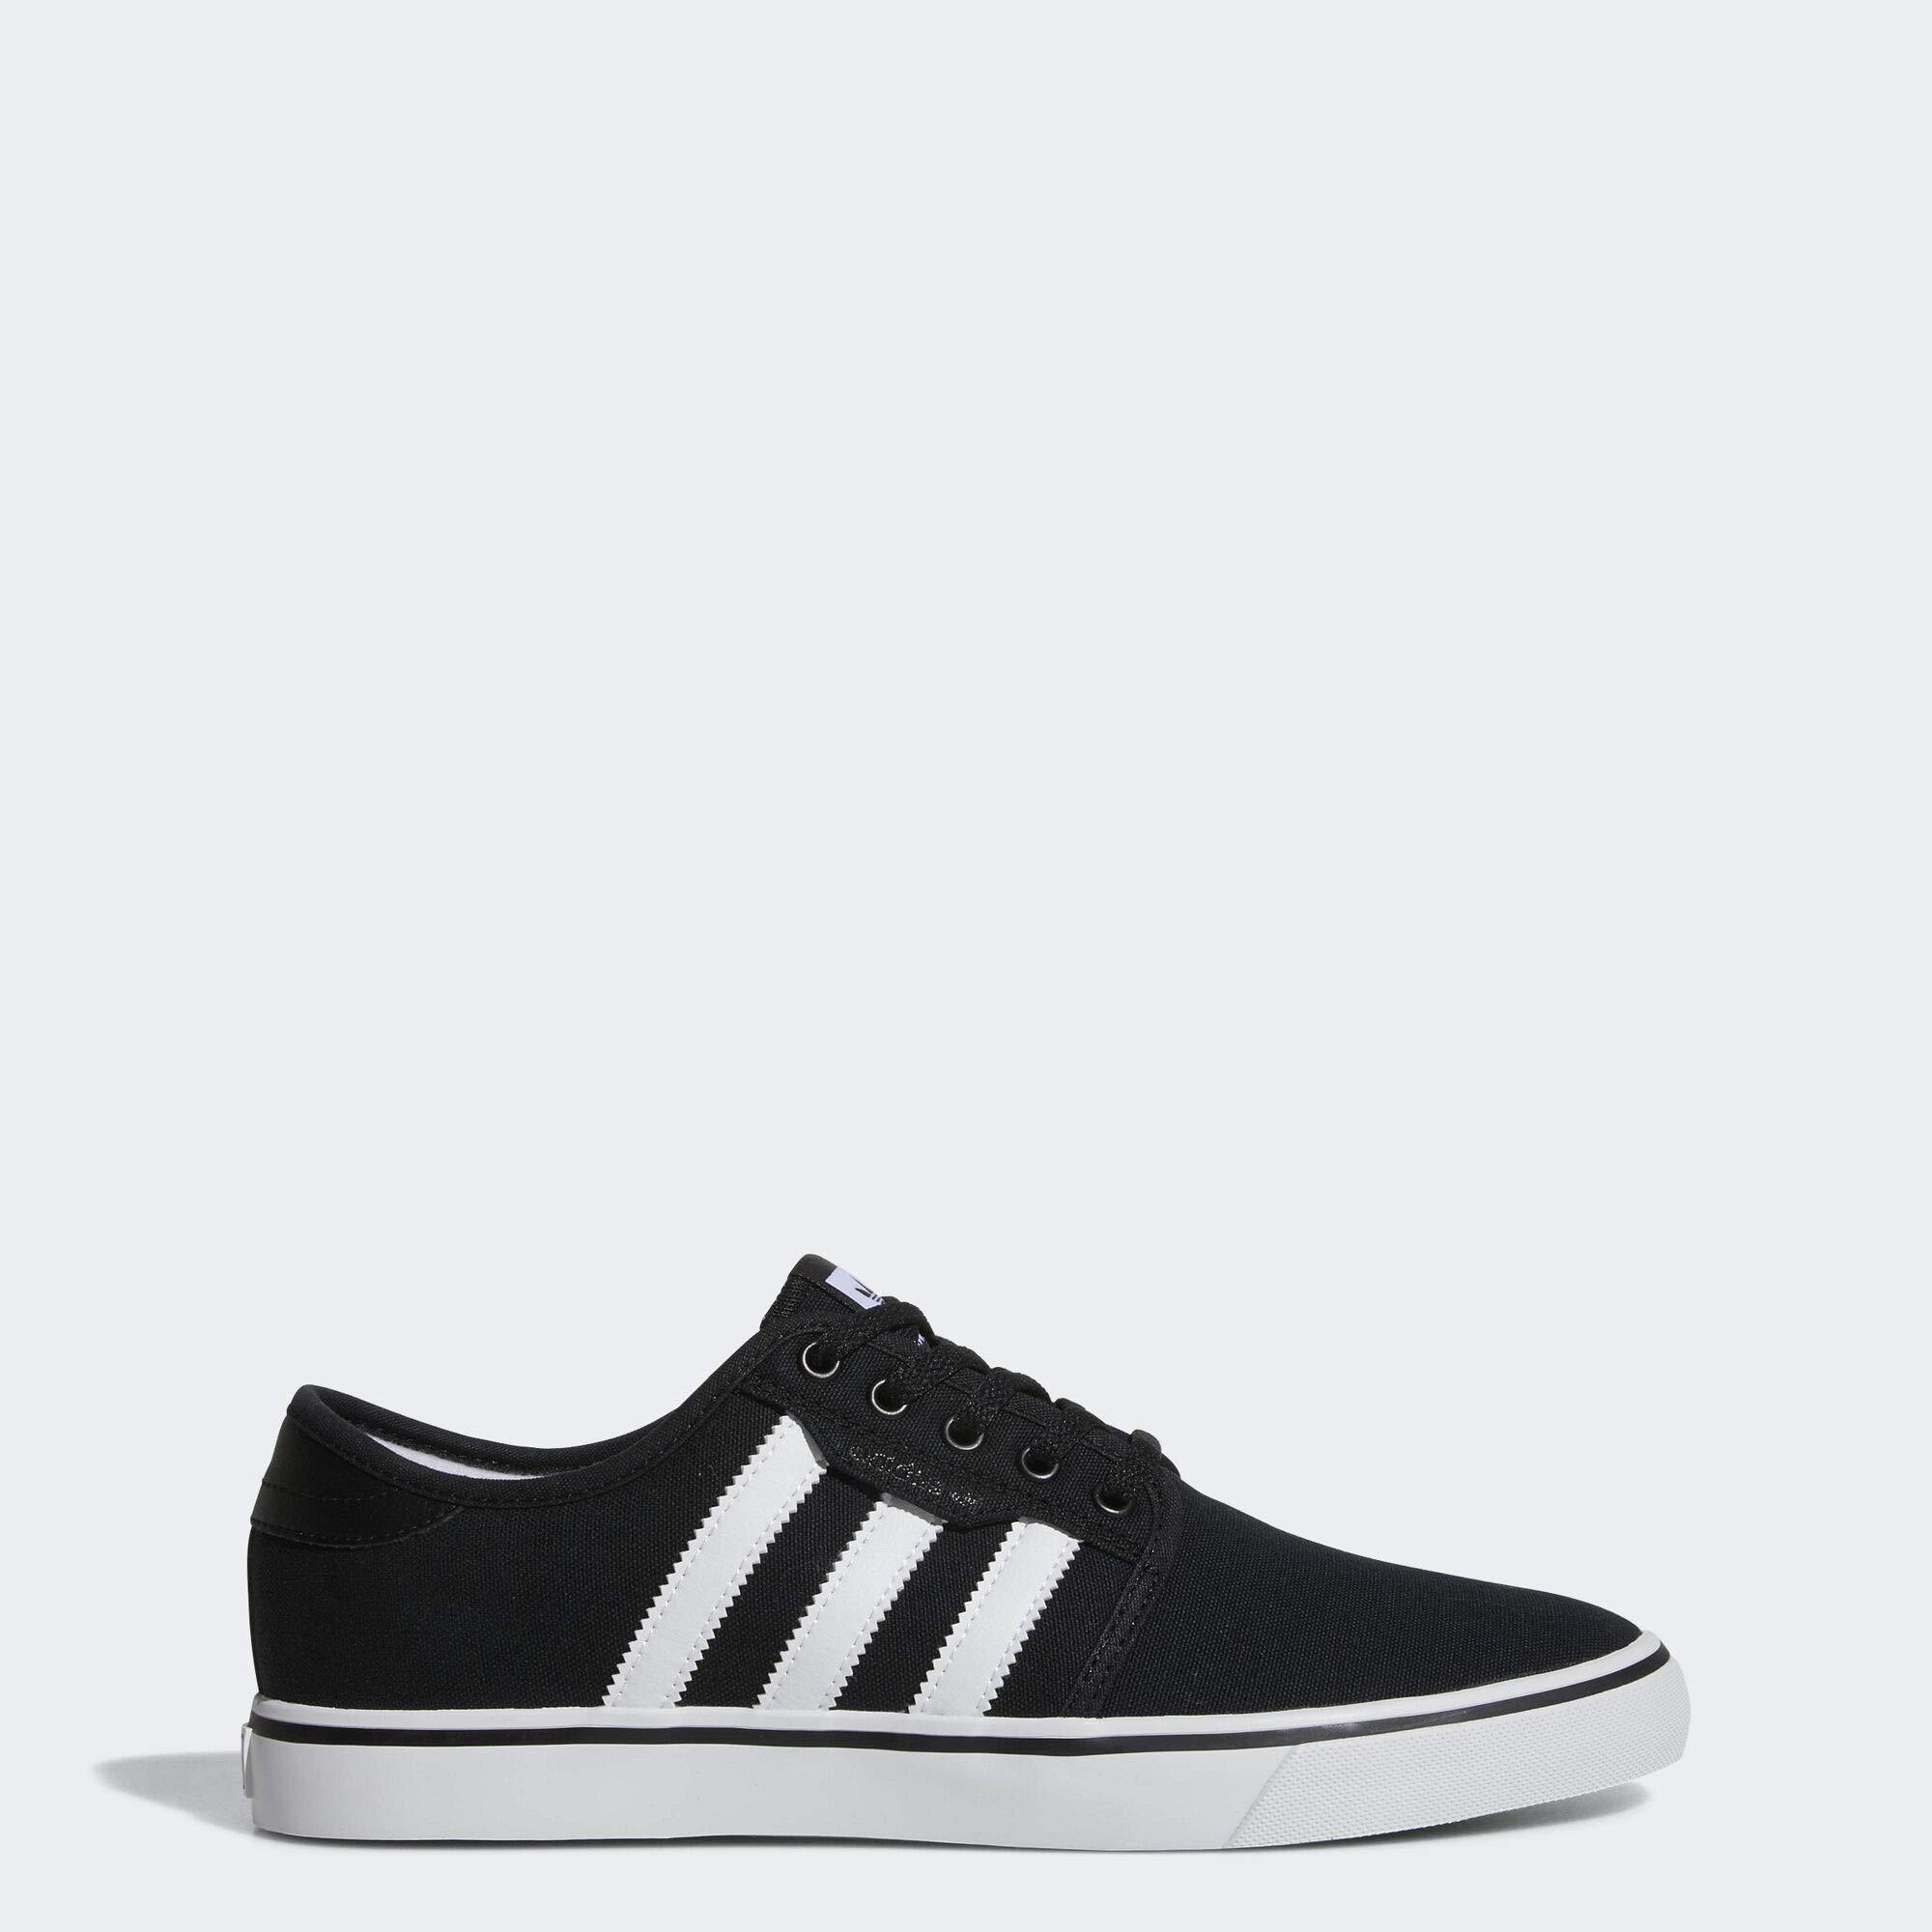 adidas Originals Men's Seeley Running Shoe, Black/White/Gum, 9 M US by adidas Originals